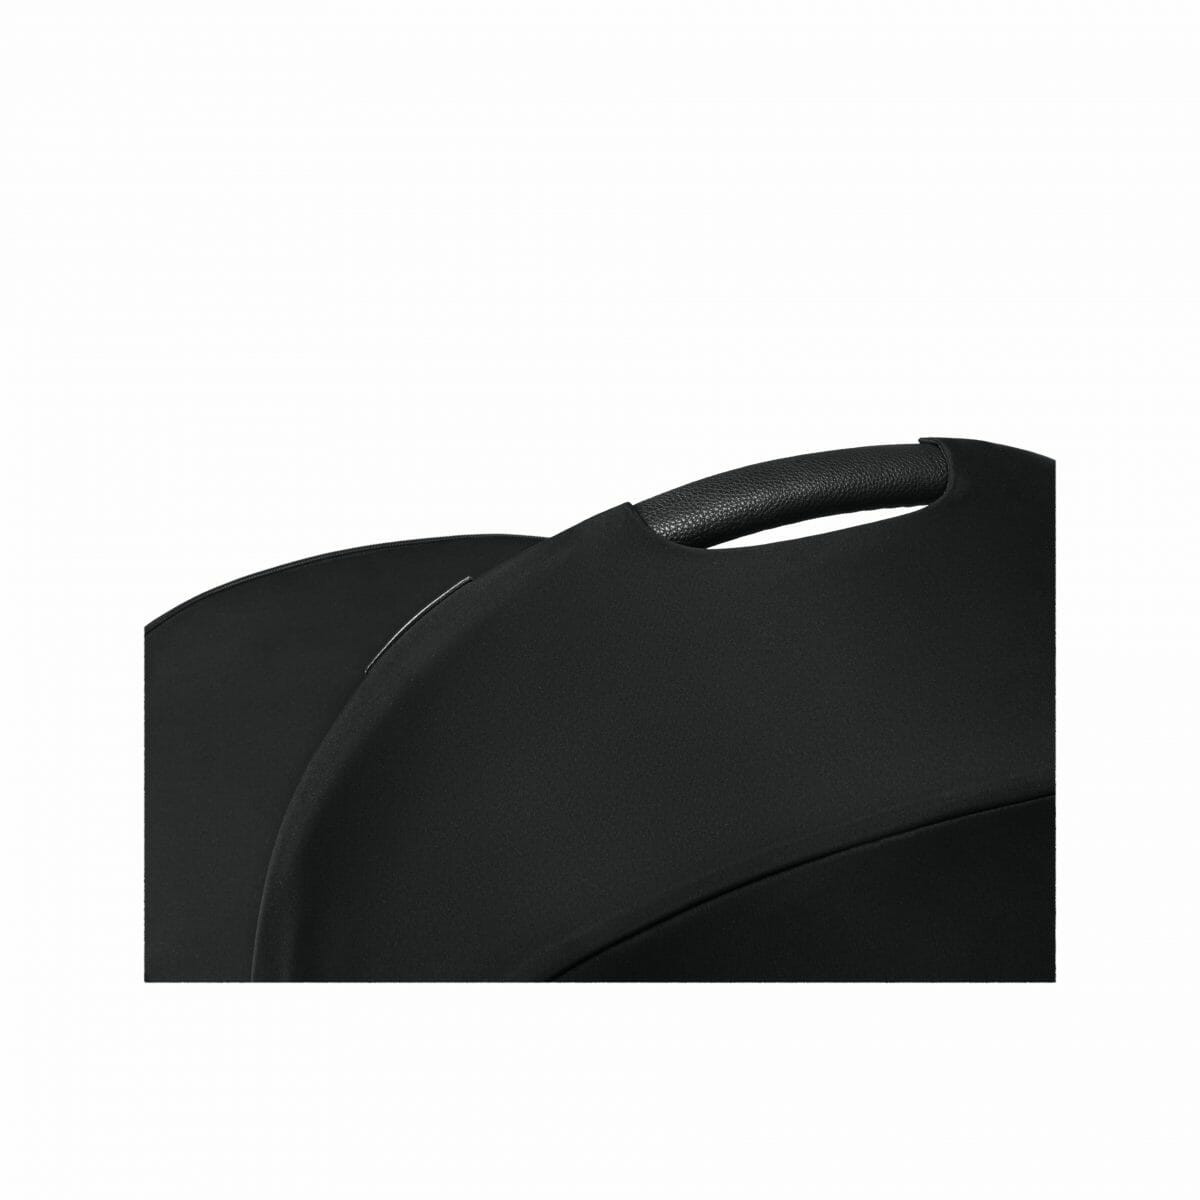 Cybex Priam Carry Cot Black Handle